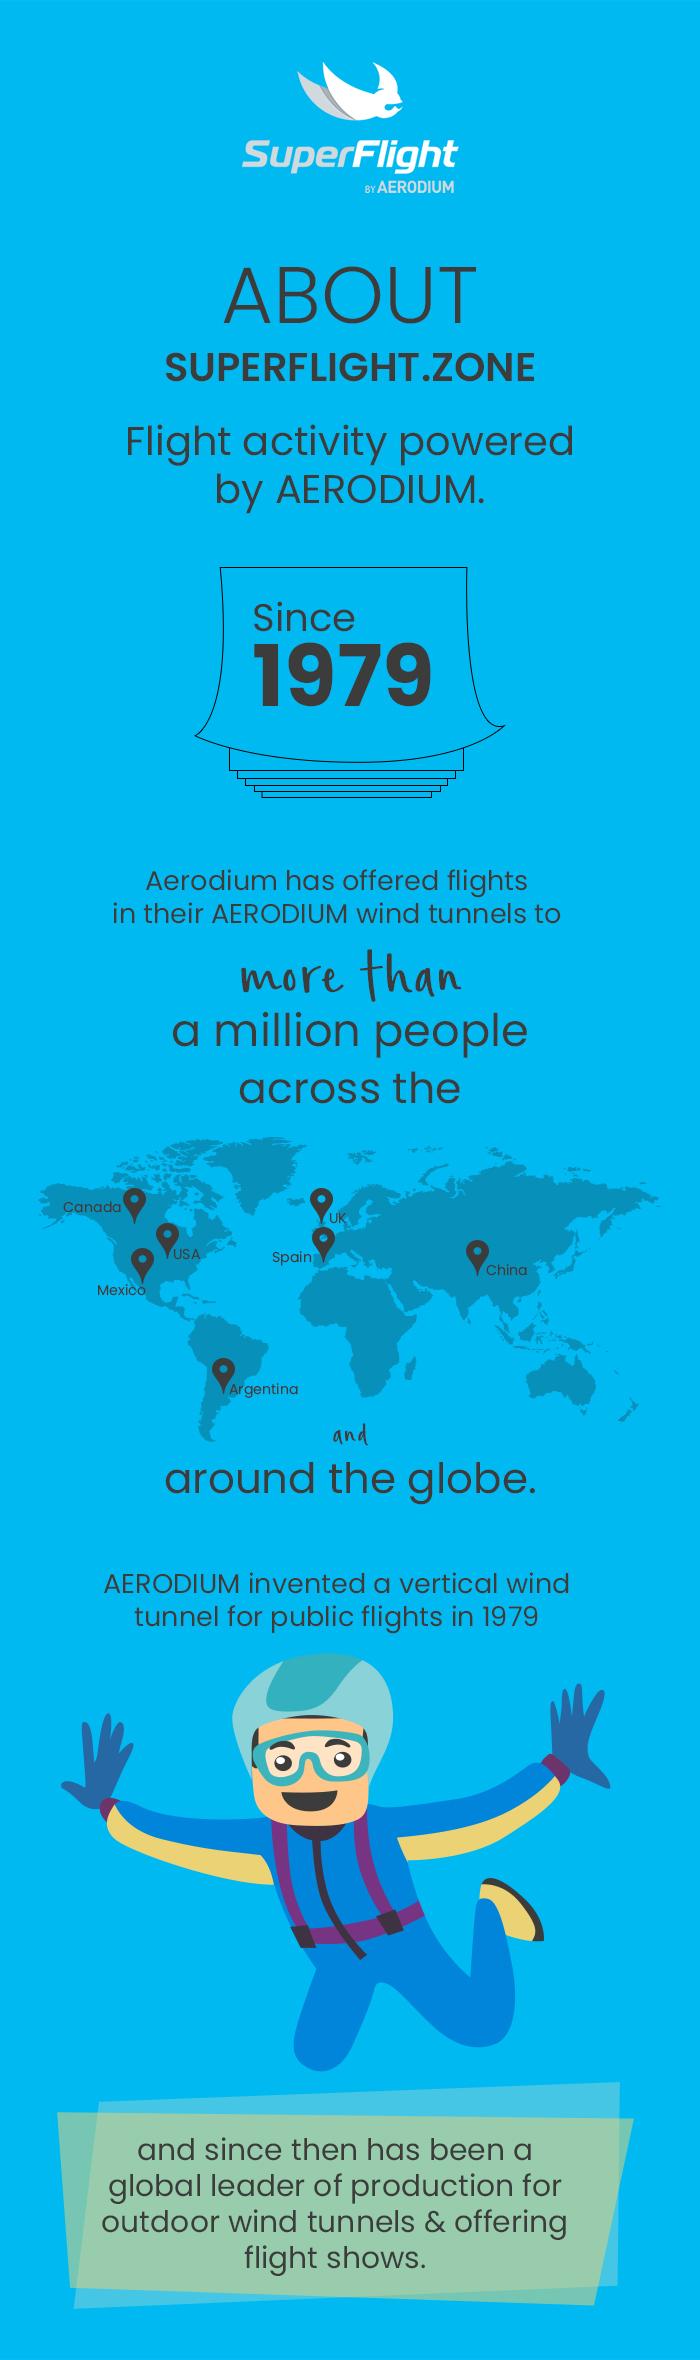 Visit SuperFlight to Avail Ultimate Flight Activities Powered by AERODIUM